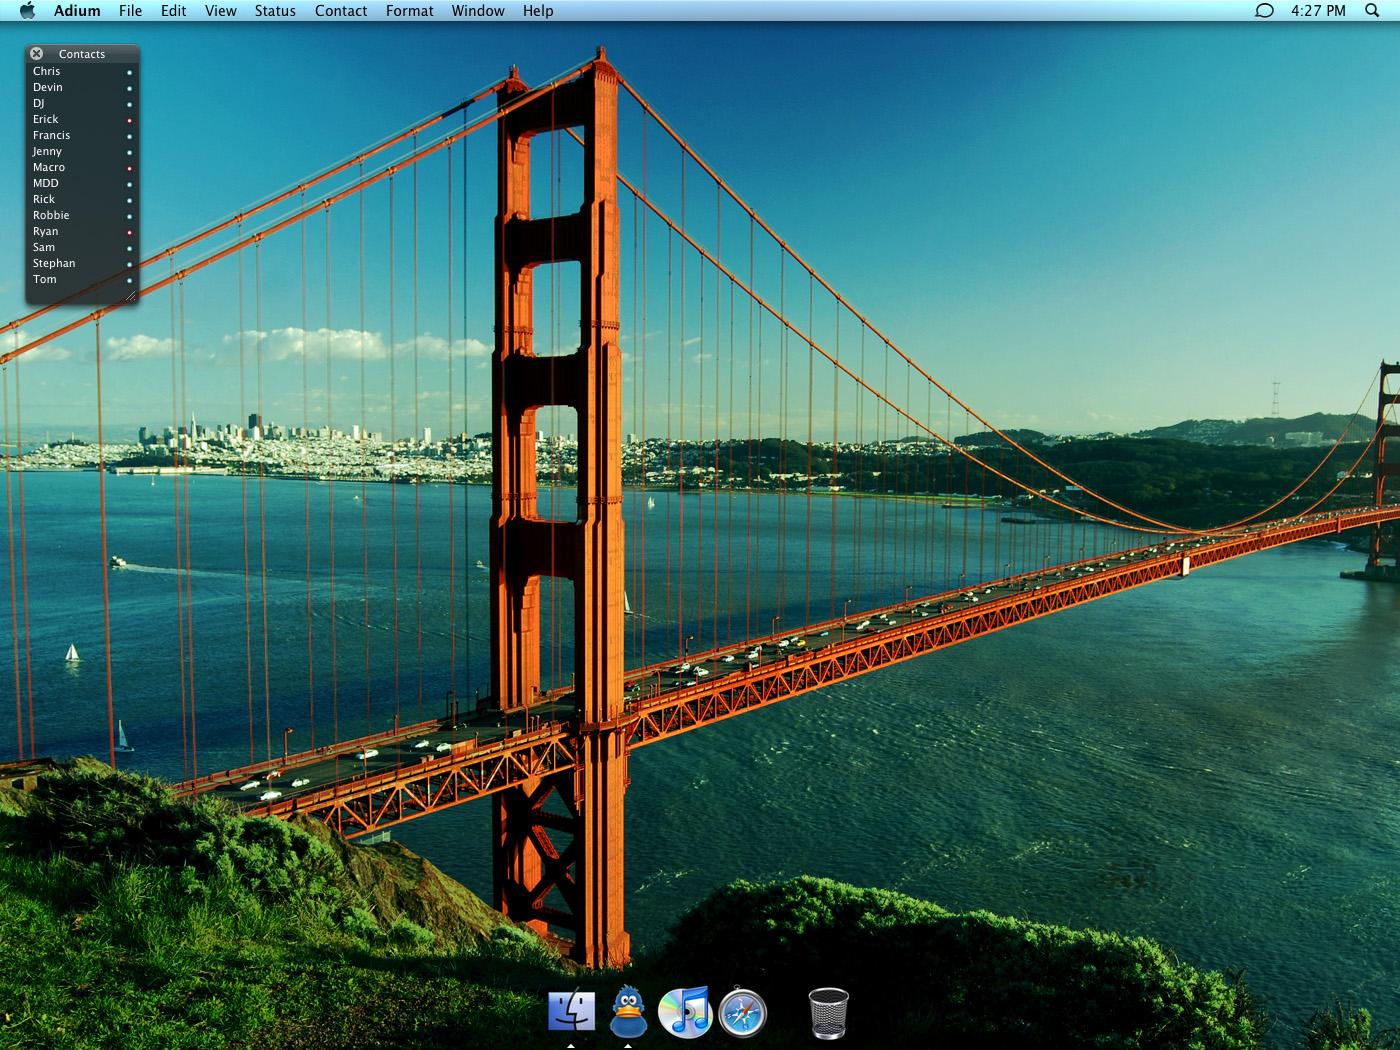 March Desktop by bishop7